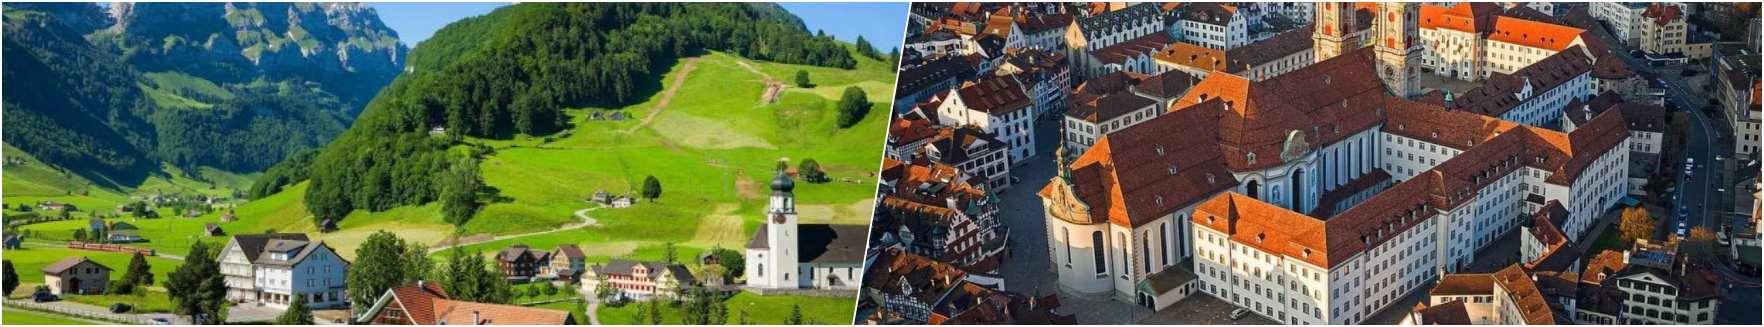 Appenzel - St. Gallen